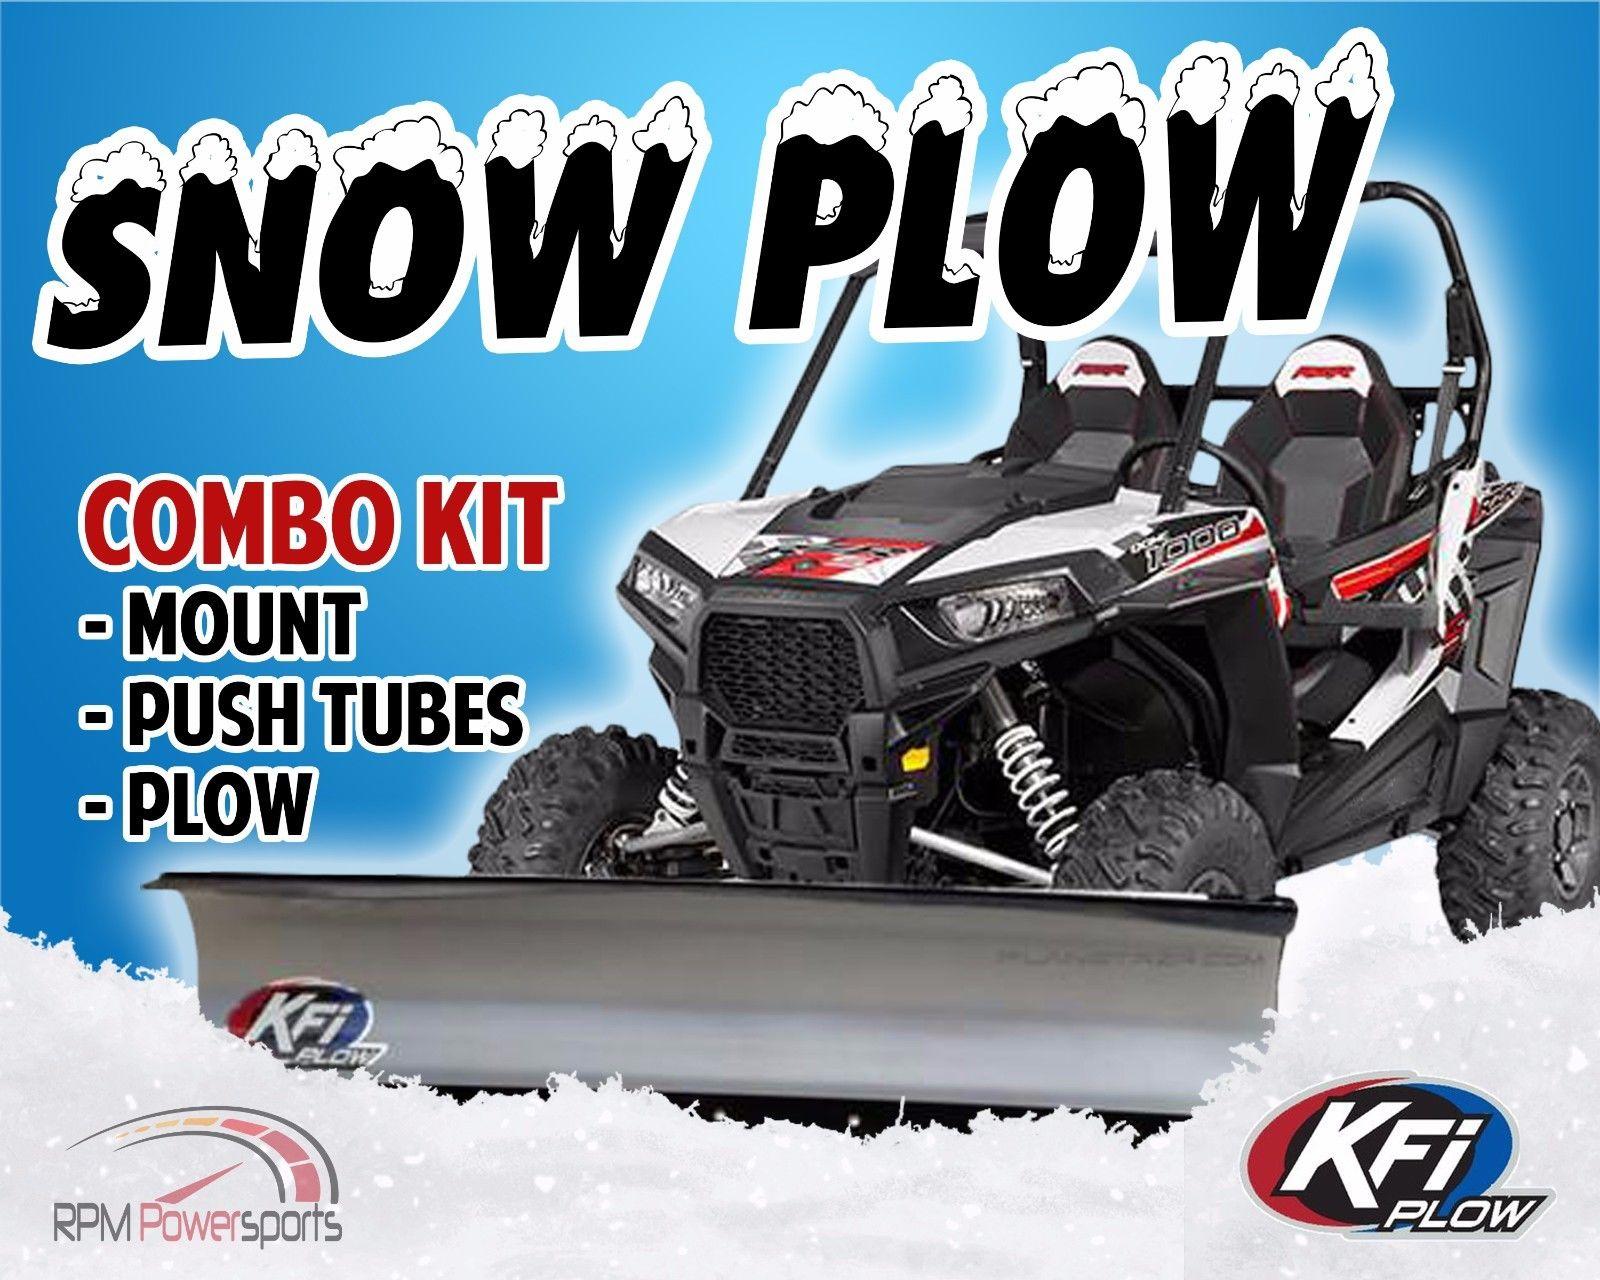 Crew 2011 2012 2013 KFI WIDE Winch Mount Kit  Polaris 500 Ranger Midsize 4x4